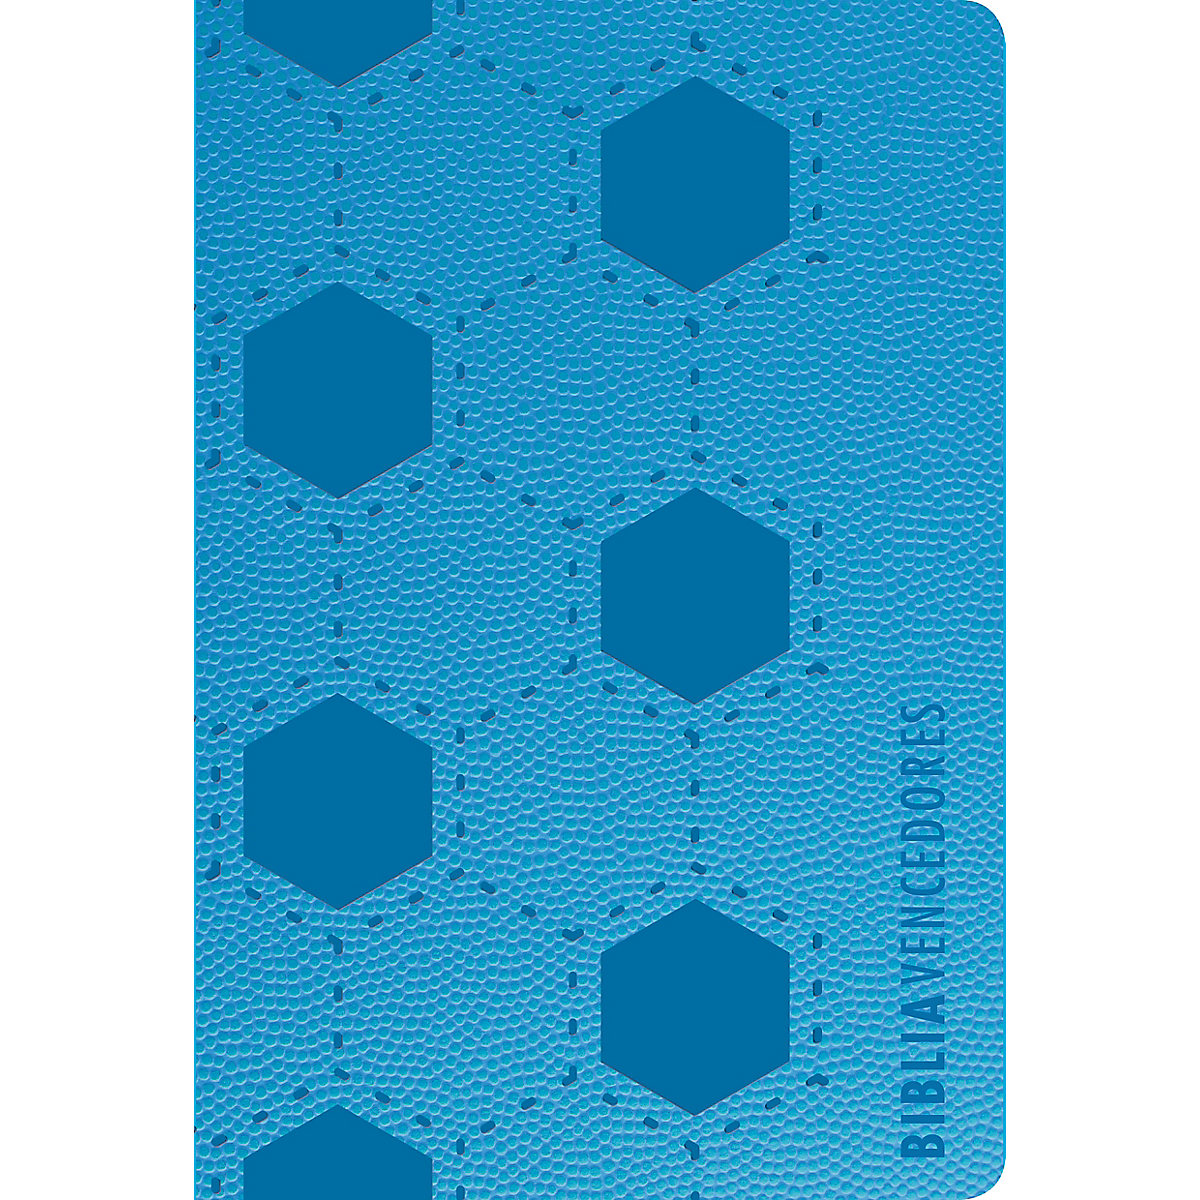 RVR 1960 Biblia vencedores, azul símil piel